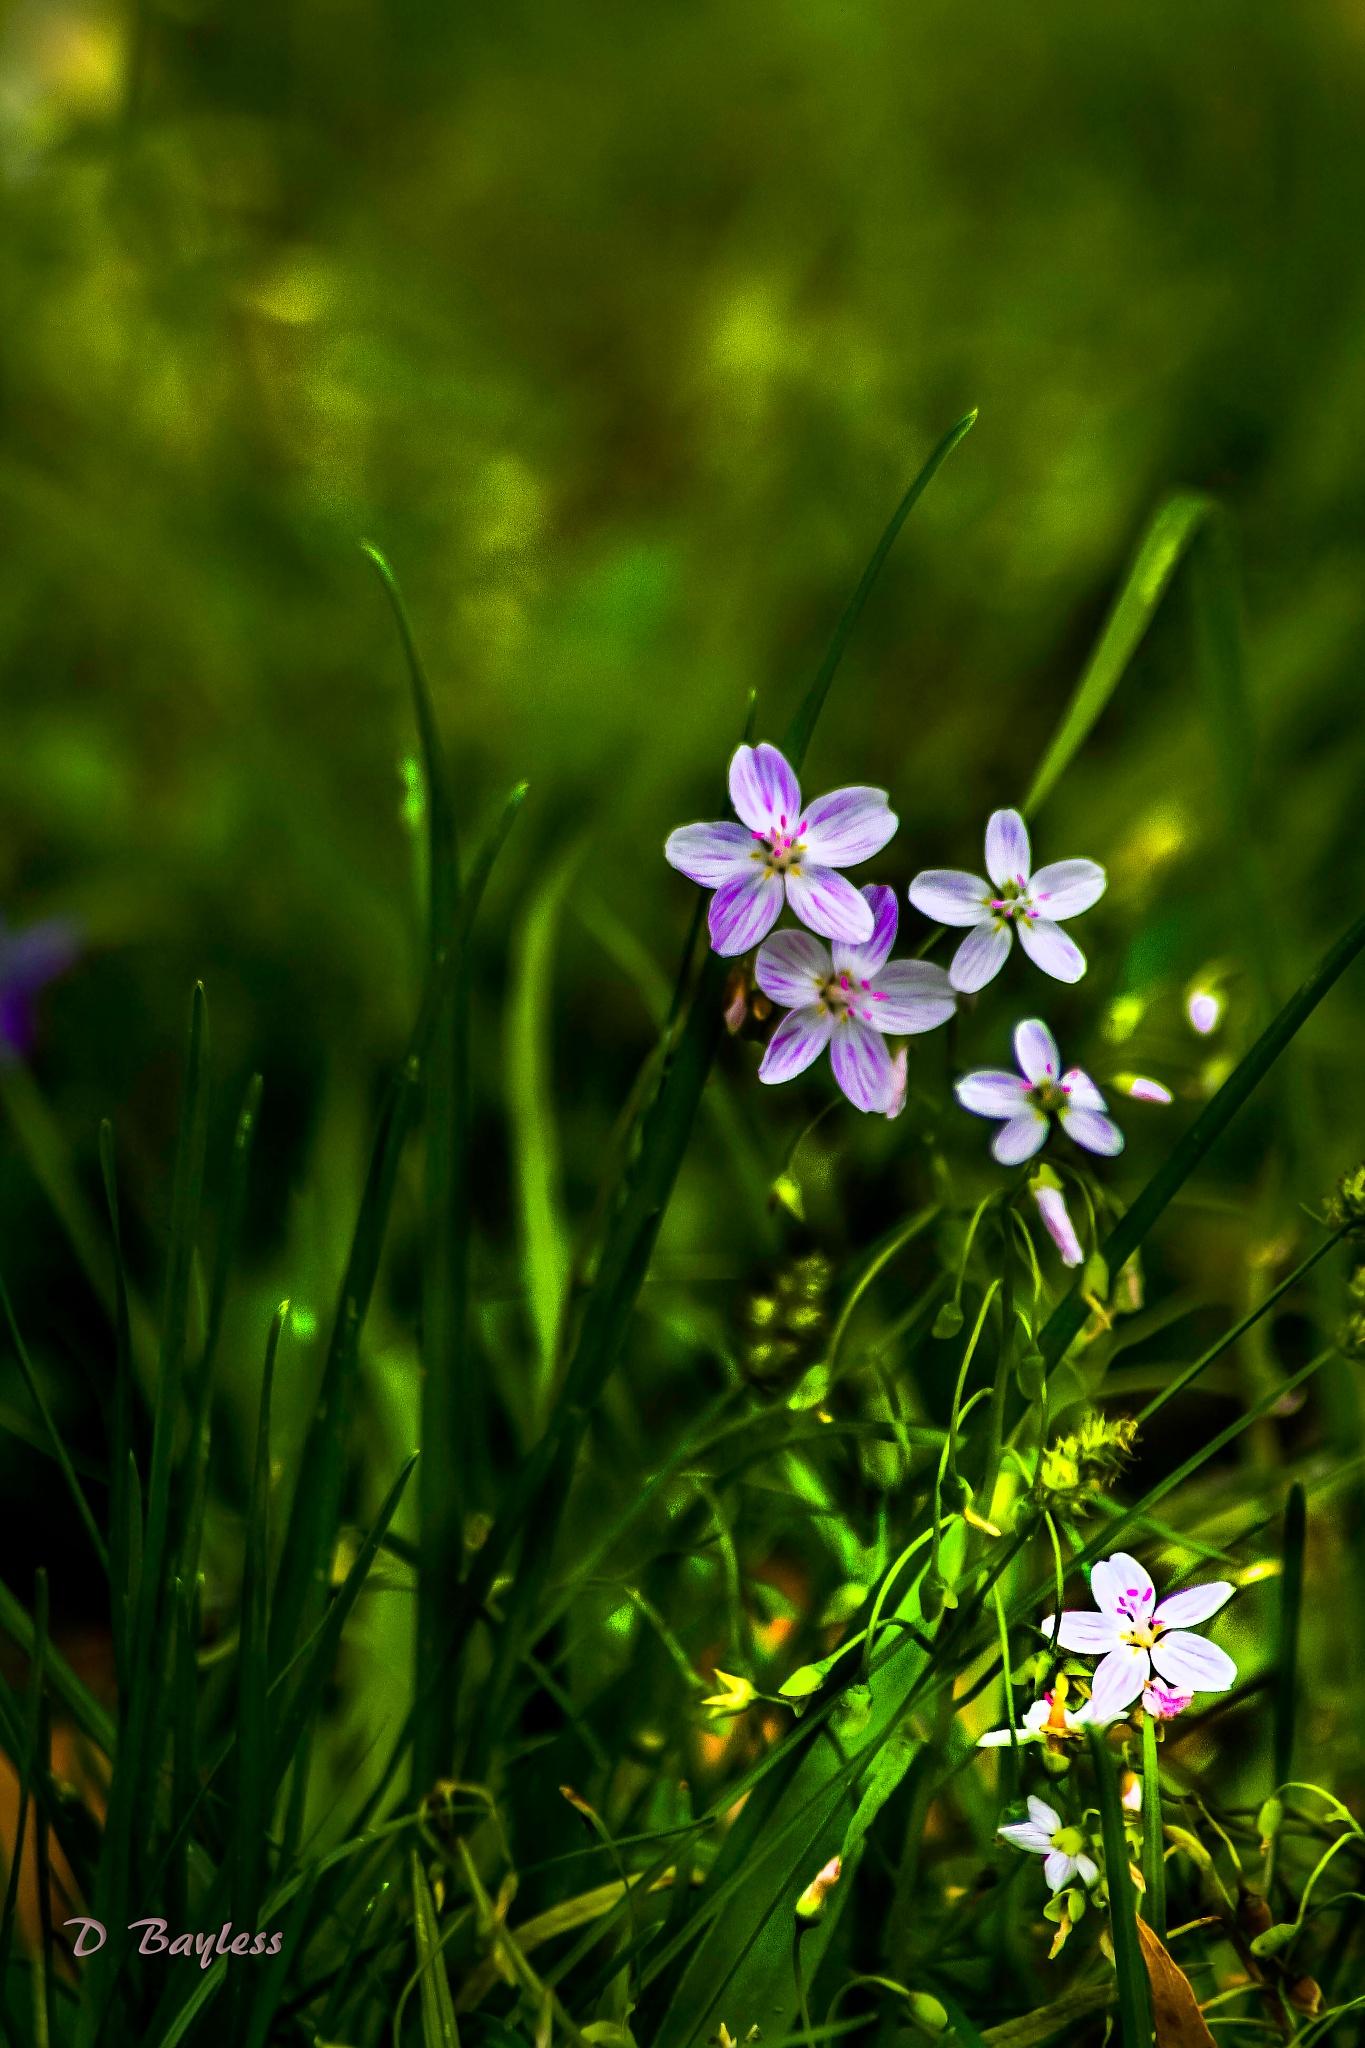 Flower Field by DebraBayless